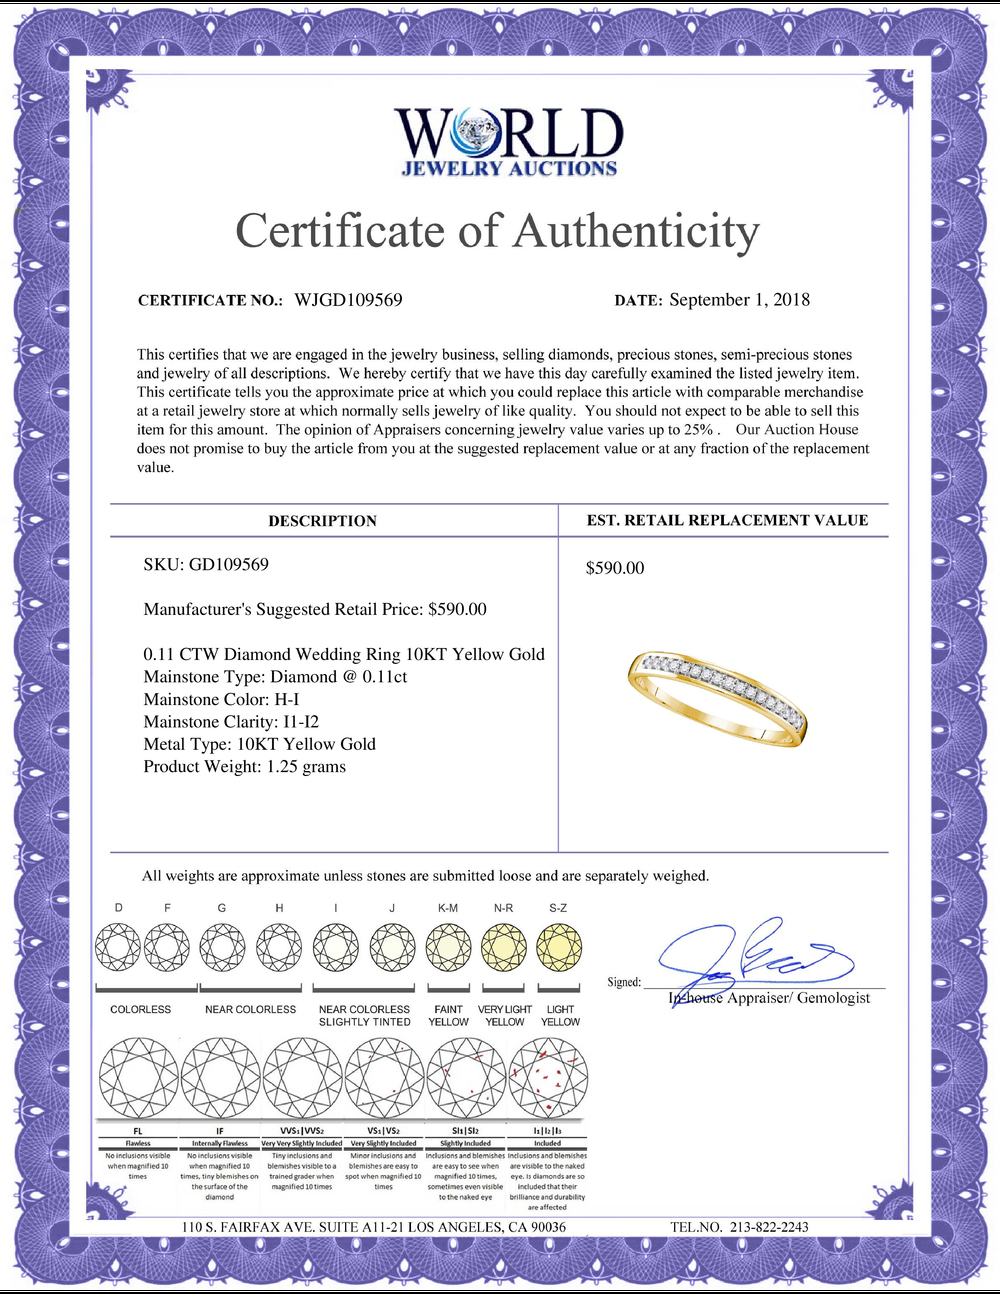 Lot 4049: 0.11 CTW Diamond Wedding Ring 10KT Yellow Gold - REF-14K9W